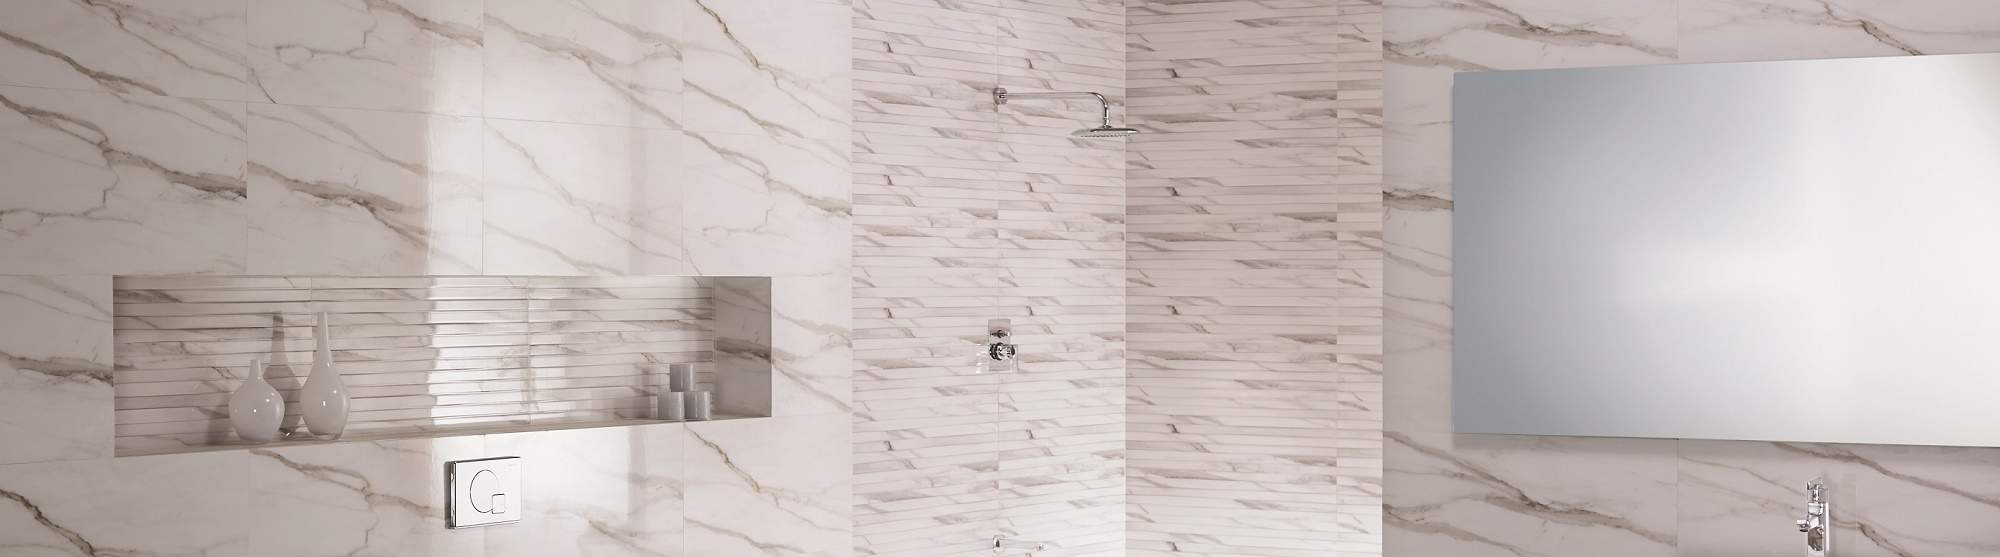 Awesome Bathroom Tiles In Hyderabad India  Joy Studio Design Gallery  Best